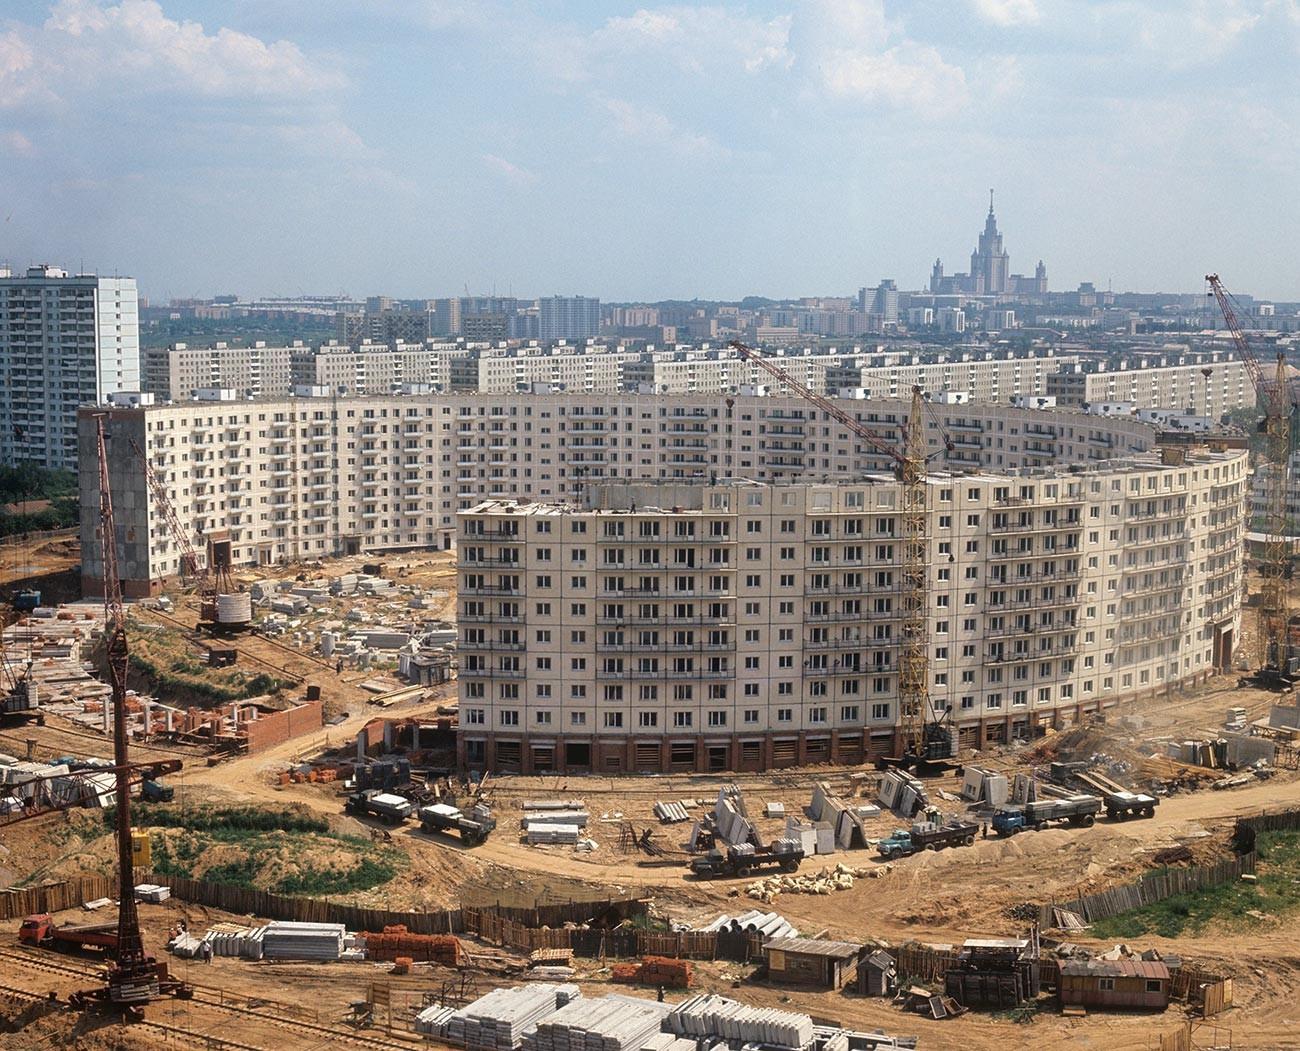 Bau eines kreisförmigen Hauses in der Neschinskaja-Straße in Moskau.